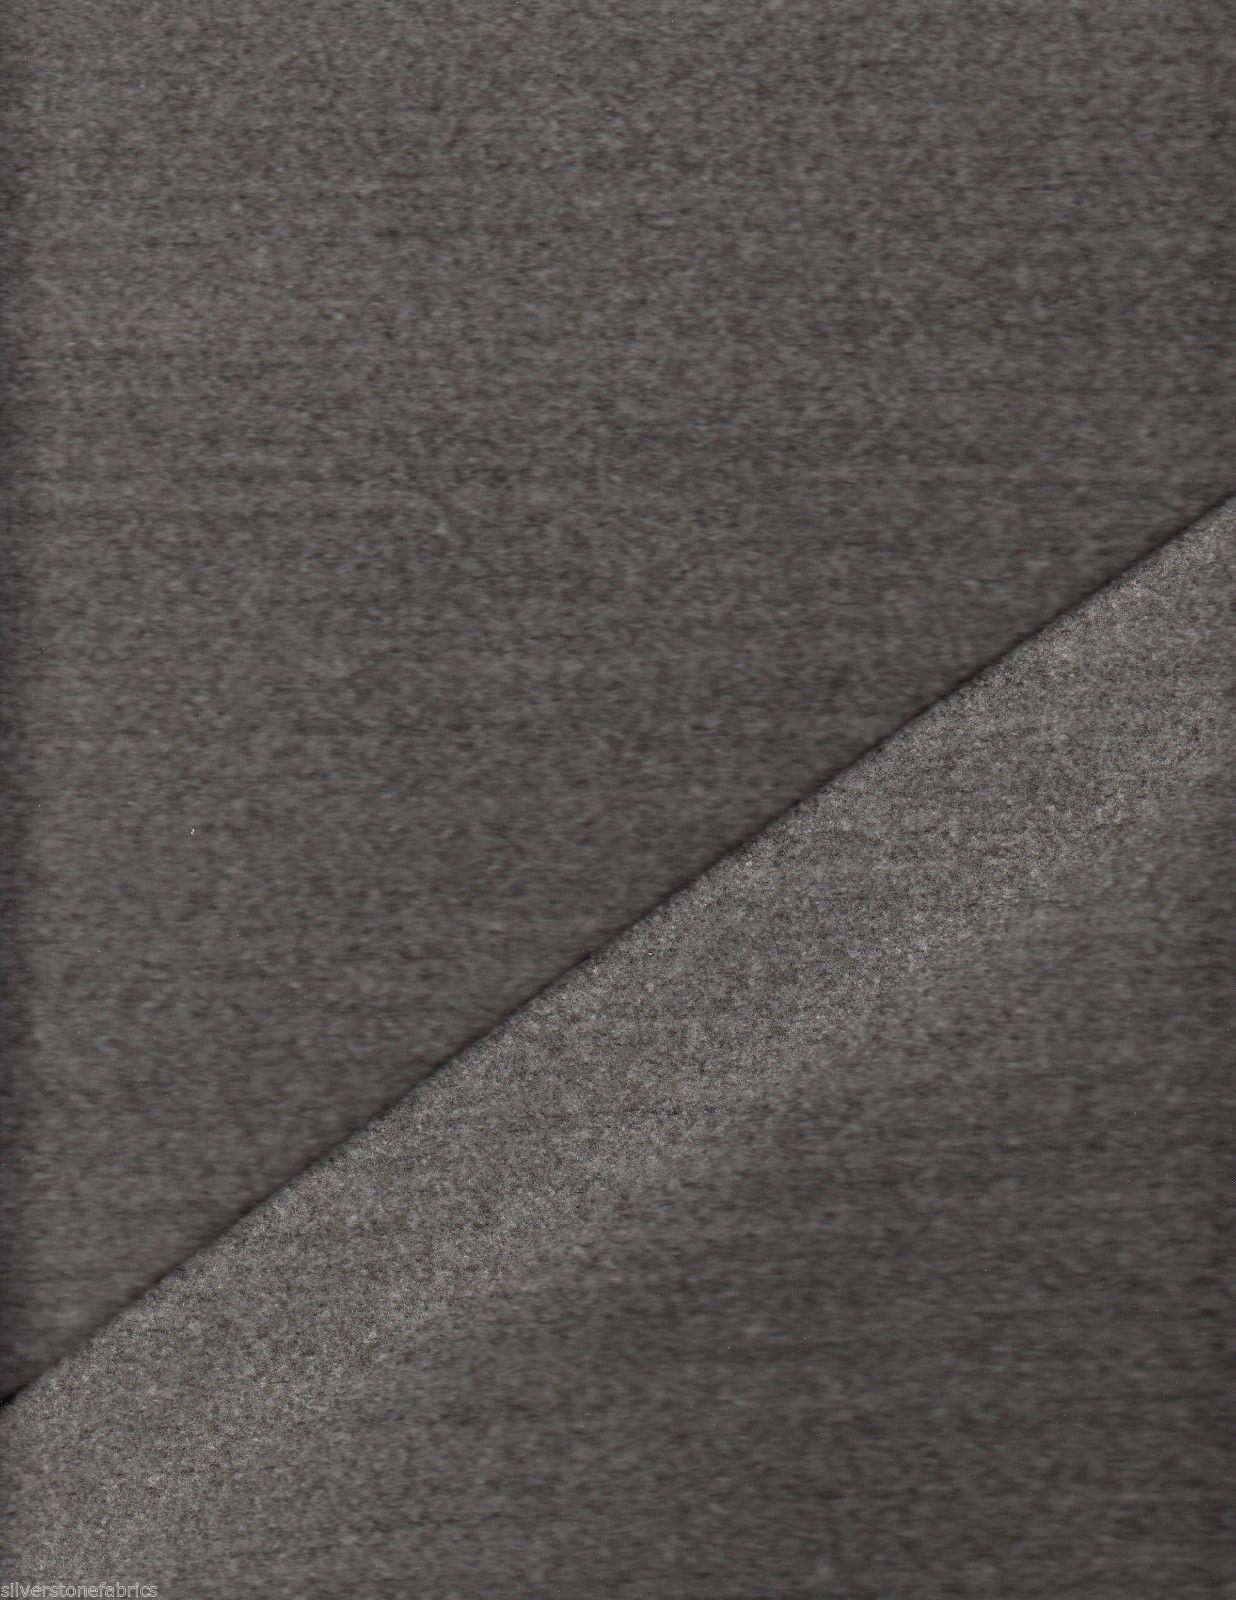 S Harris Mid Century Lambourne Heather Gray Upholstery Fabric 5 yds DD4